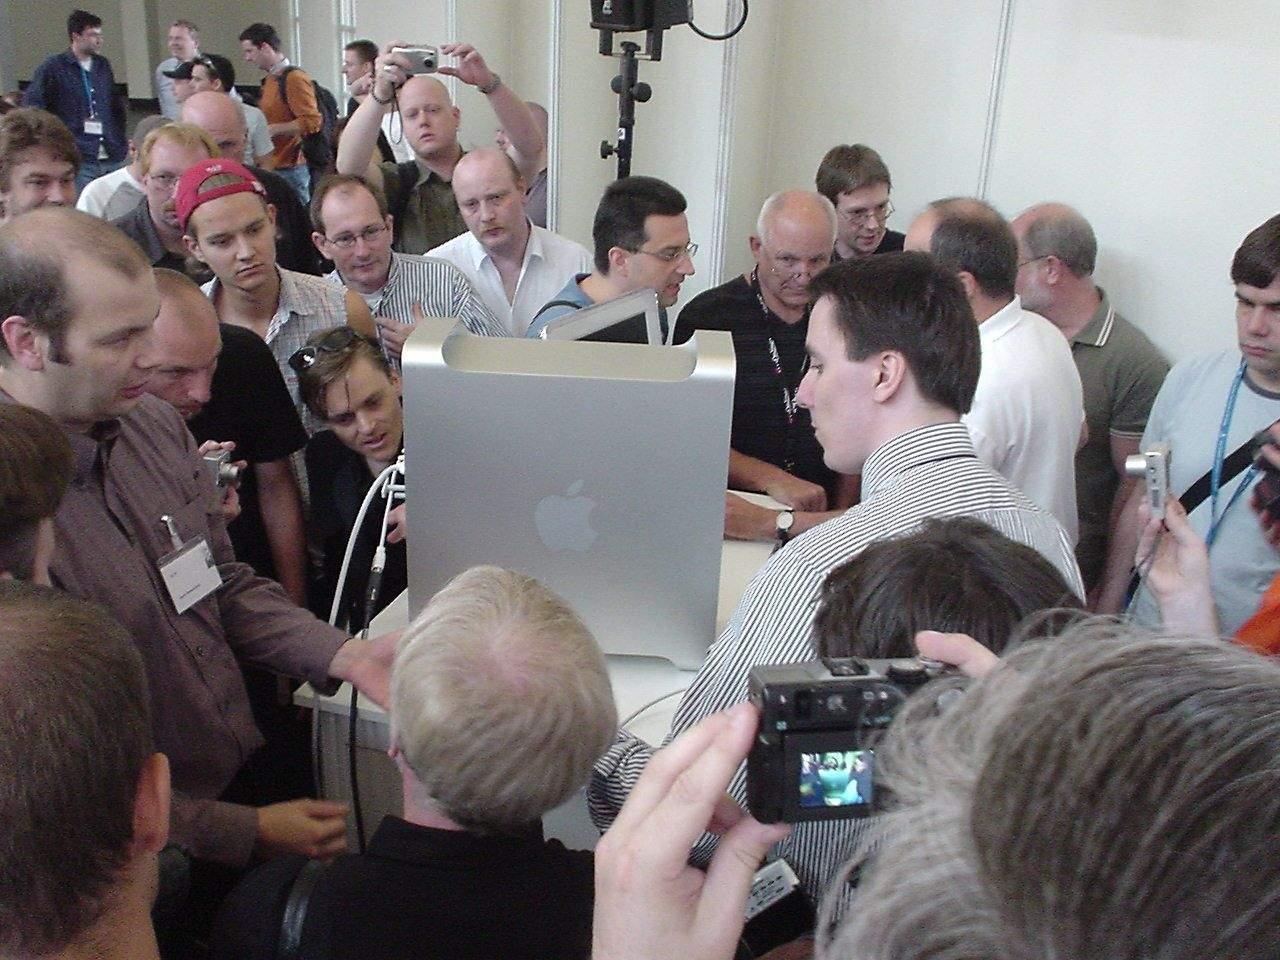 Crowds gather to admire the Power Mac G5 (http://www.rttm.de/G5/source/dsc00375.html)